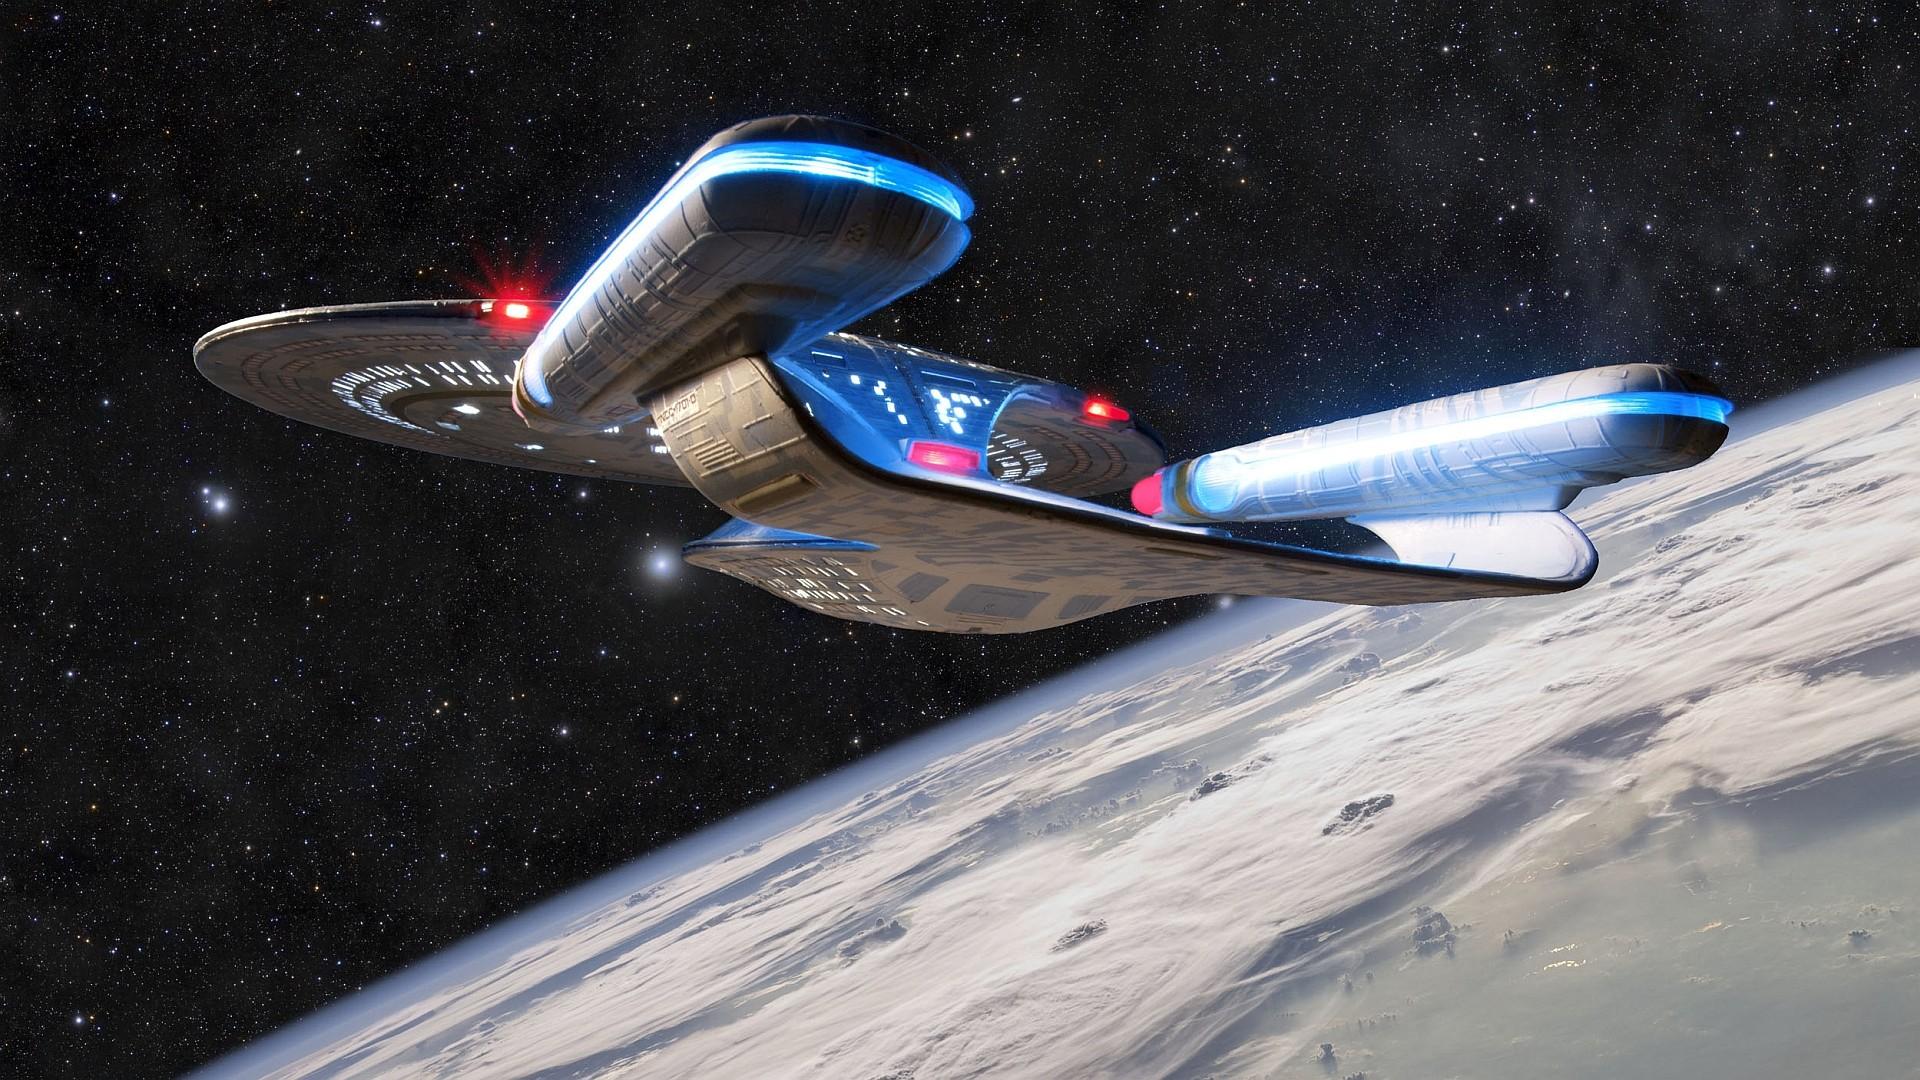 USS Enterprise [1920×1080] (xpost from /r/OtakuVisualArts) …